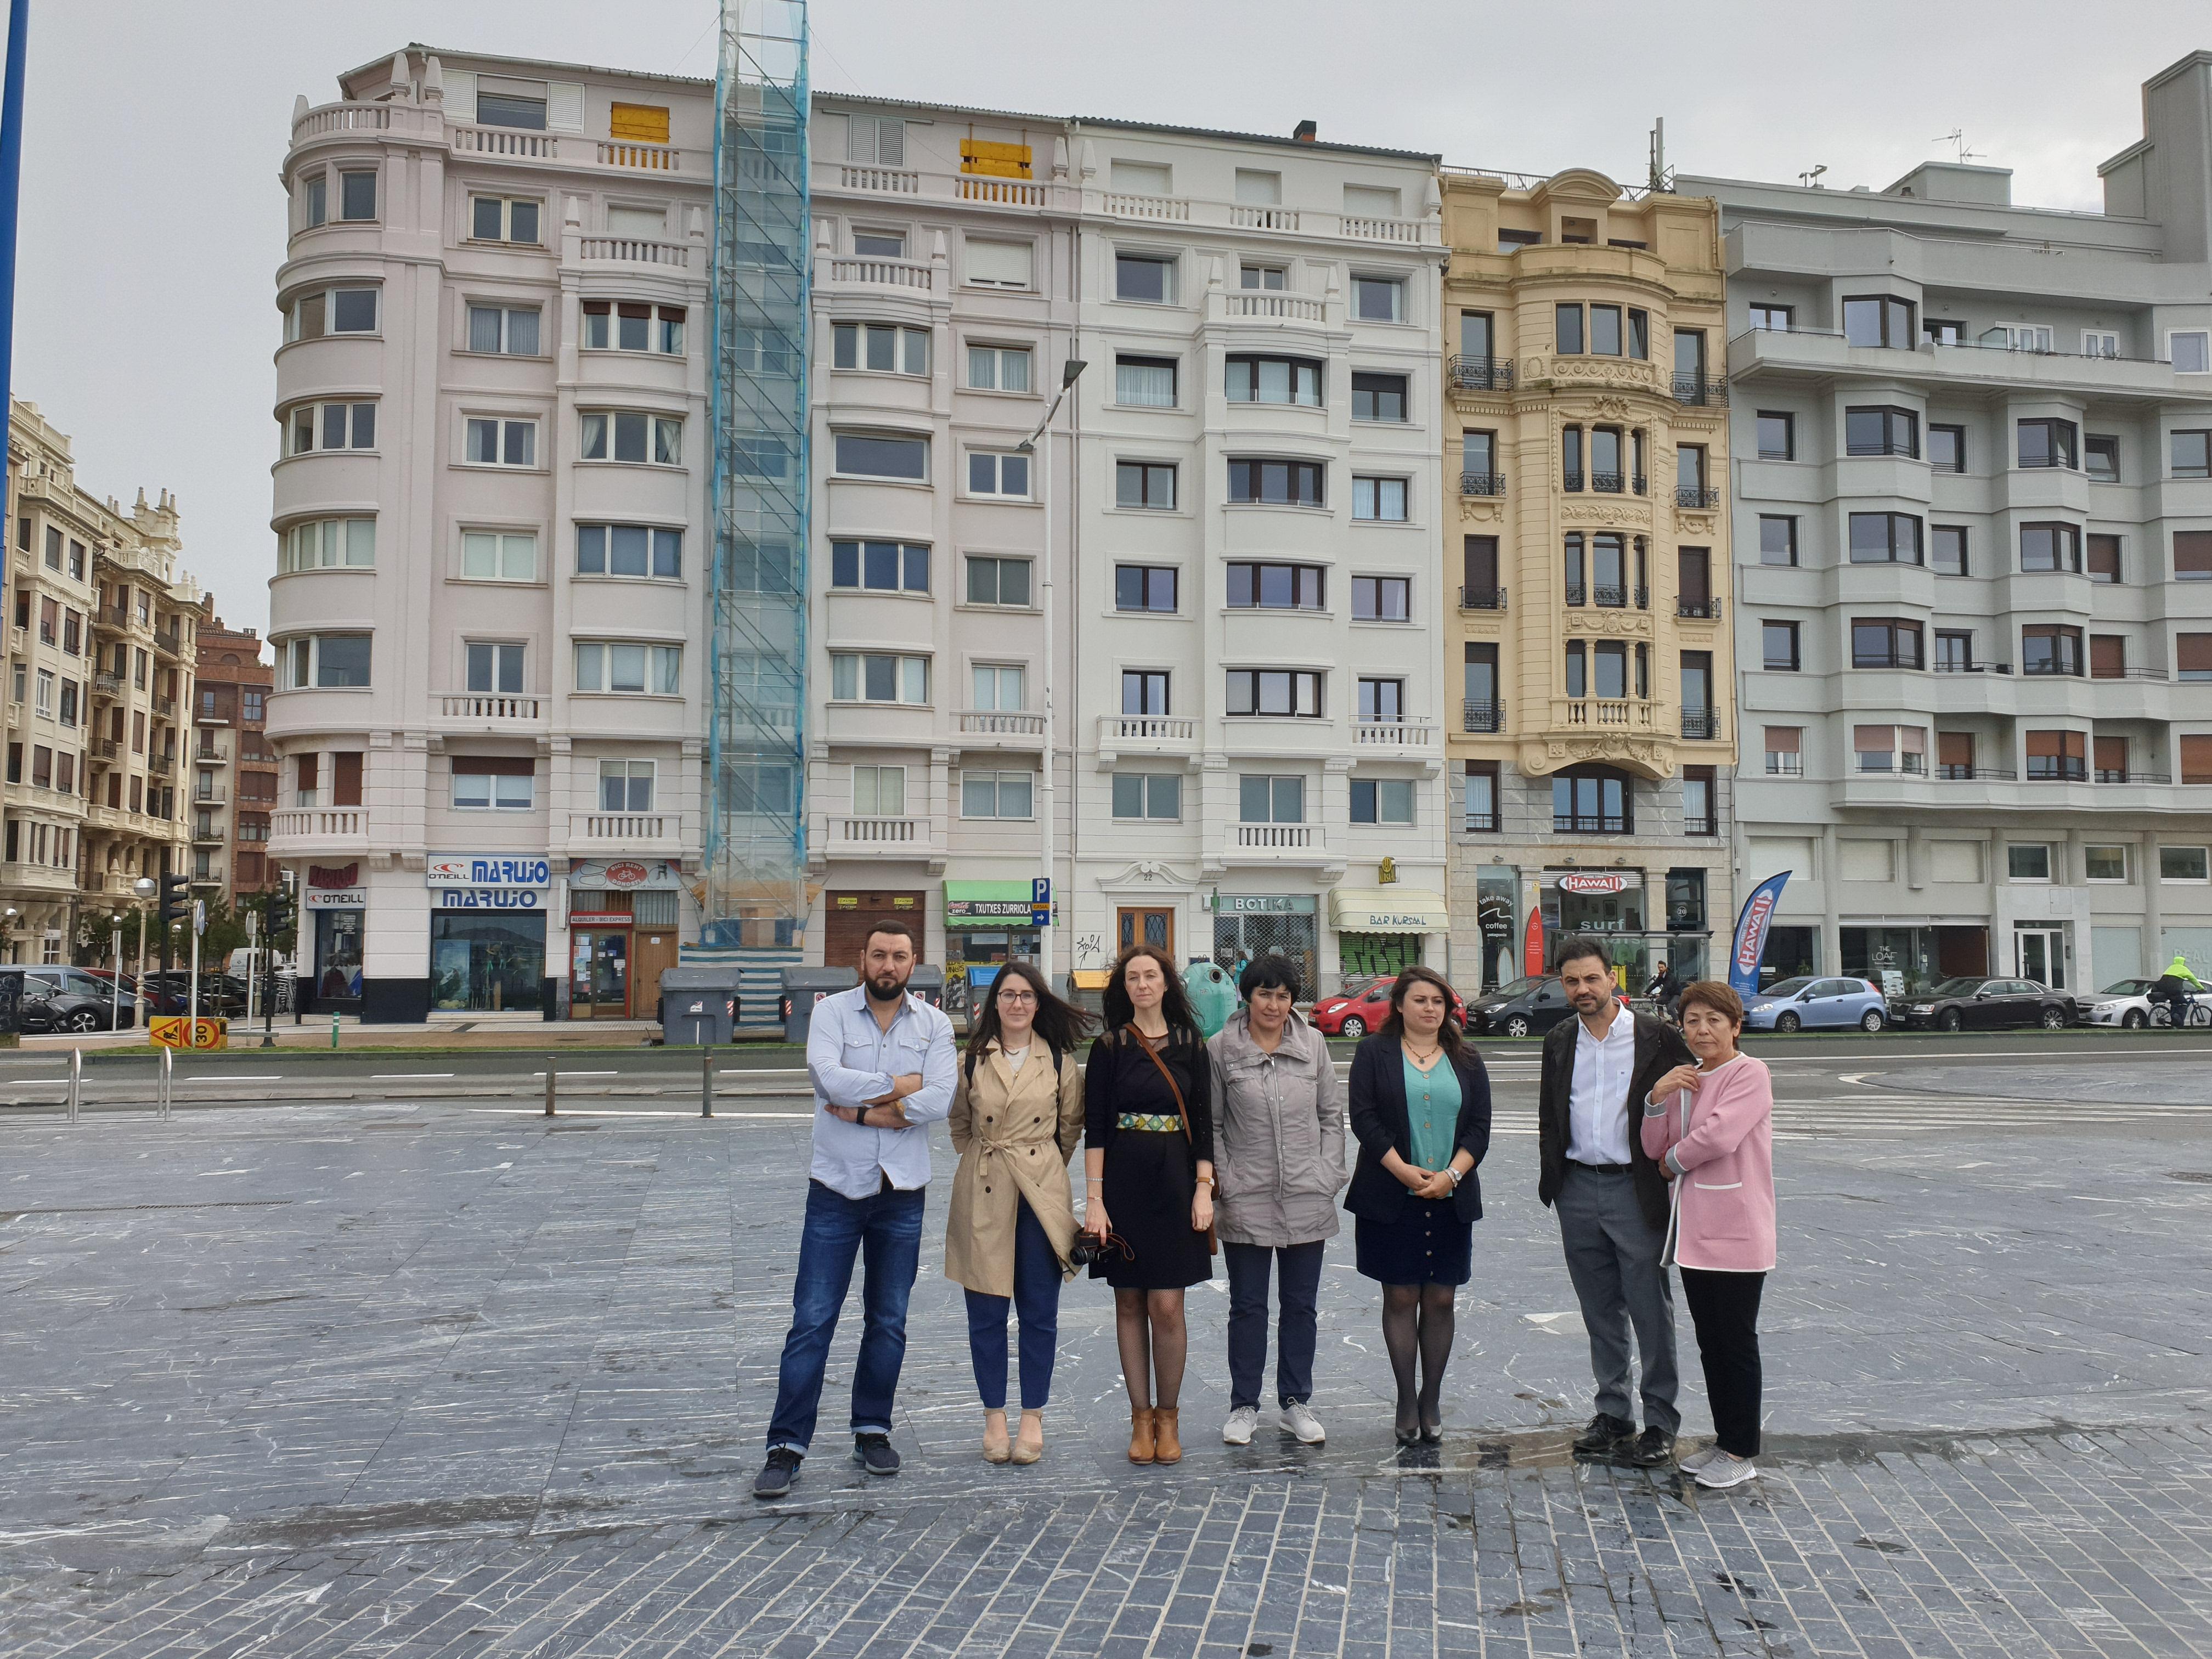 imagen 4 de noticia: noticia-una-delegacin-de-empresas-e-instituciones-de-kazajitn-visita-por-segunda-vez-kursaal-rehabilitaciones